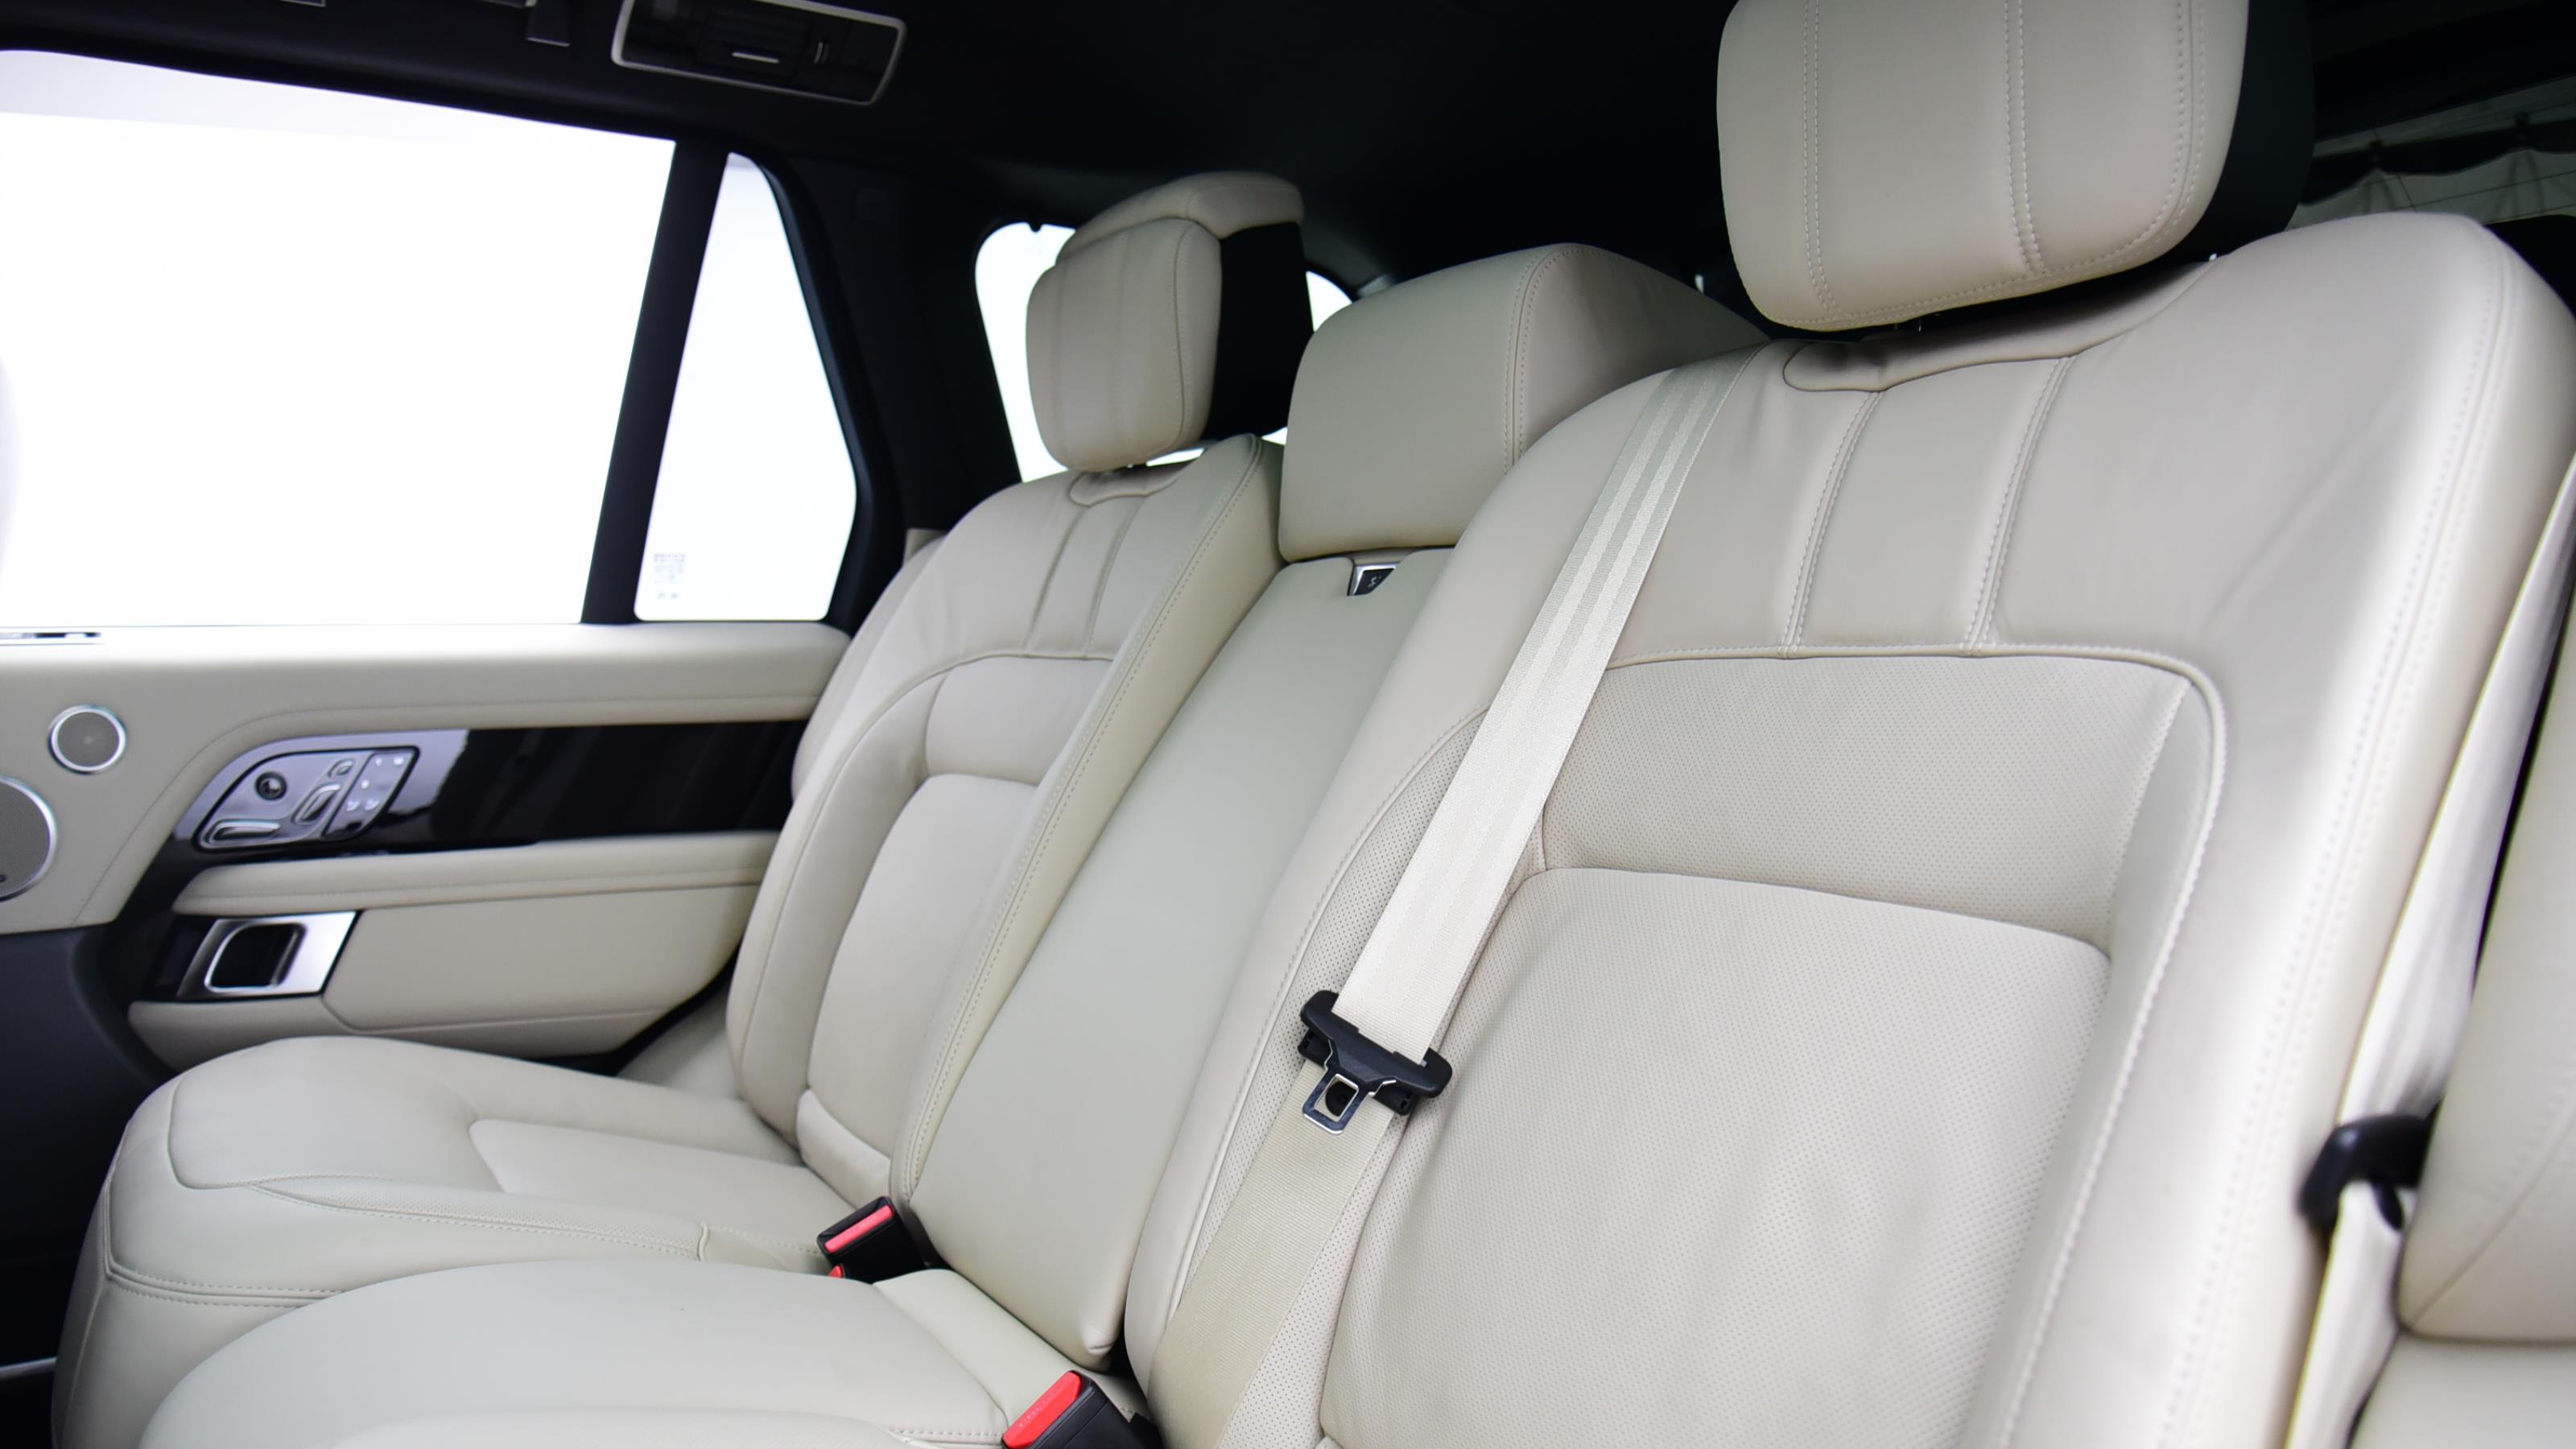 Used 2019 Land Rover RANGE ROVER 4.4 SDV8 Autobiography 4dr Auto ORANGE at Saxton4x4